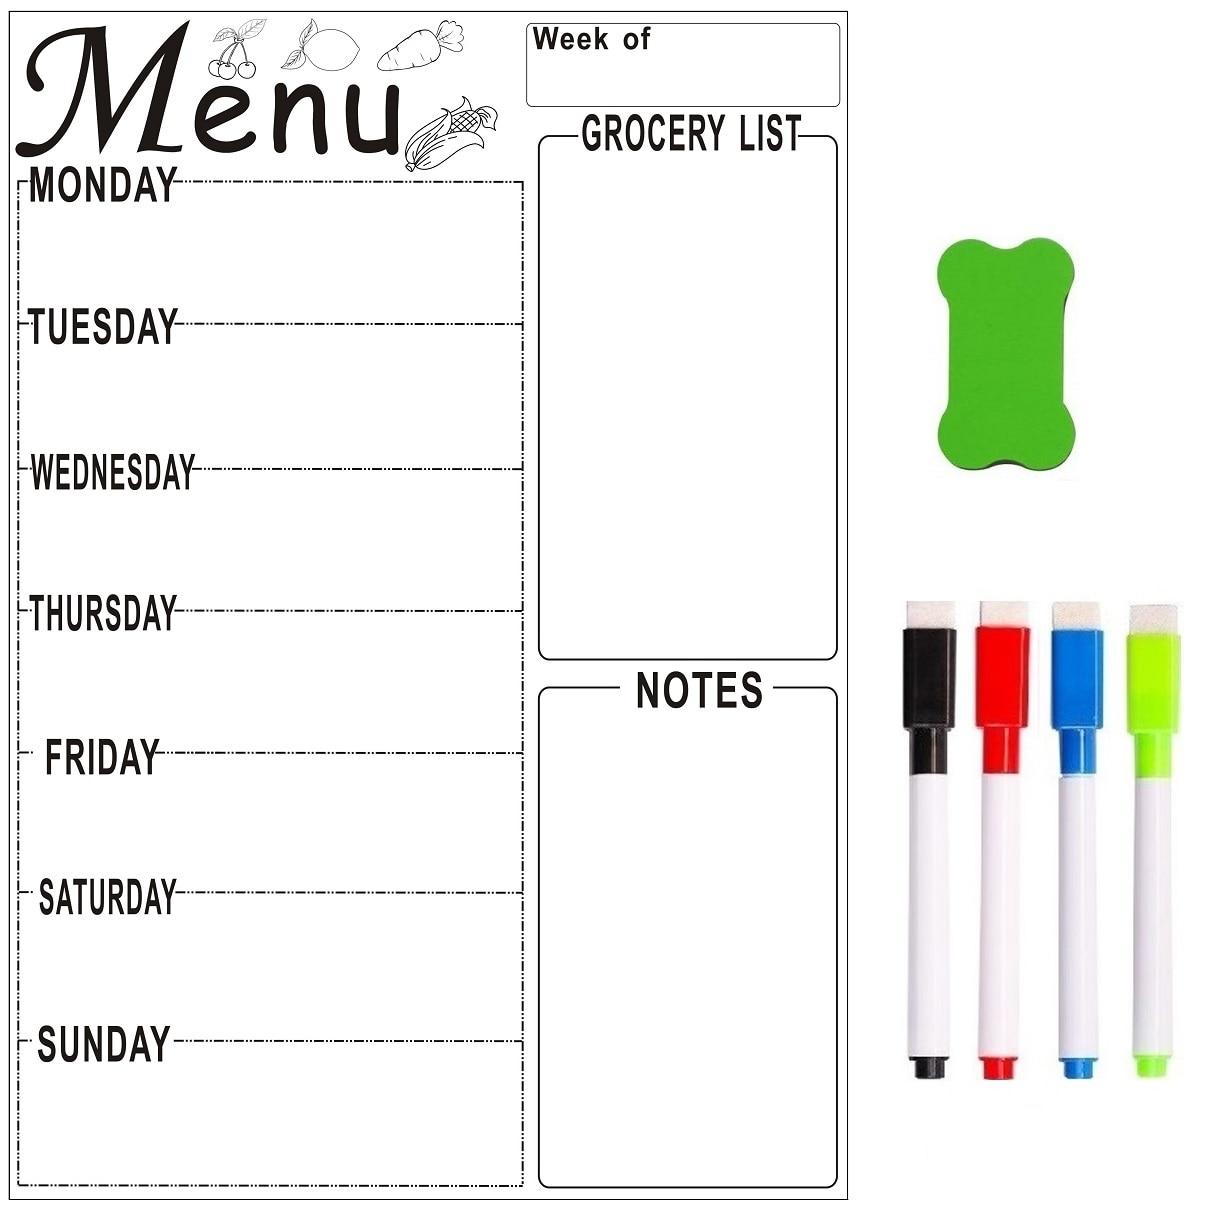 A4 Magnetic Refrigerator Whiteboard Weekly Menu Meal Planner Grocery To Do List Fridge Sticker Marker Pen Calendar Erase Board